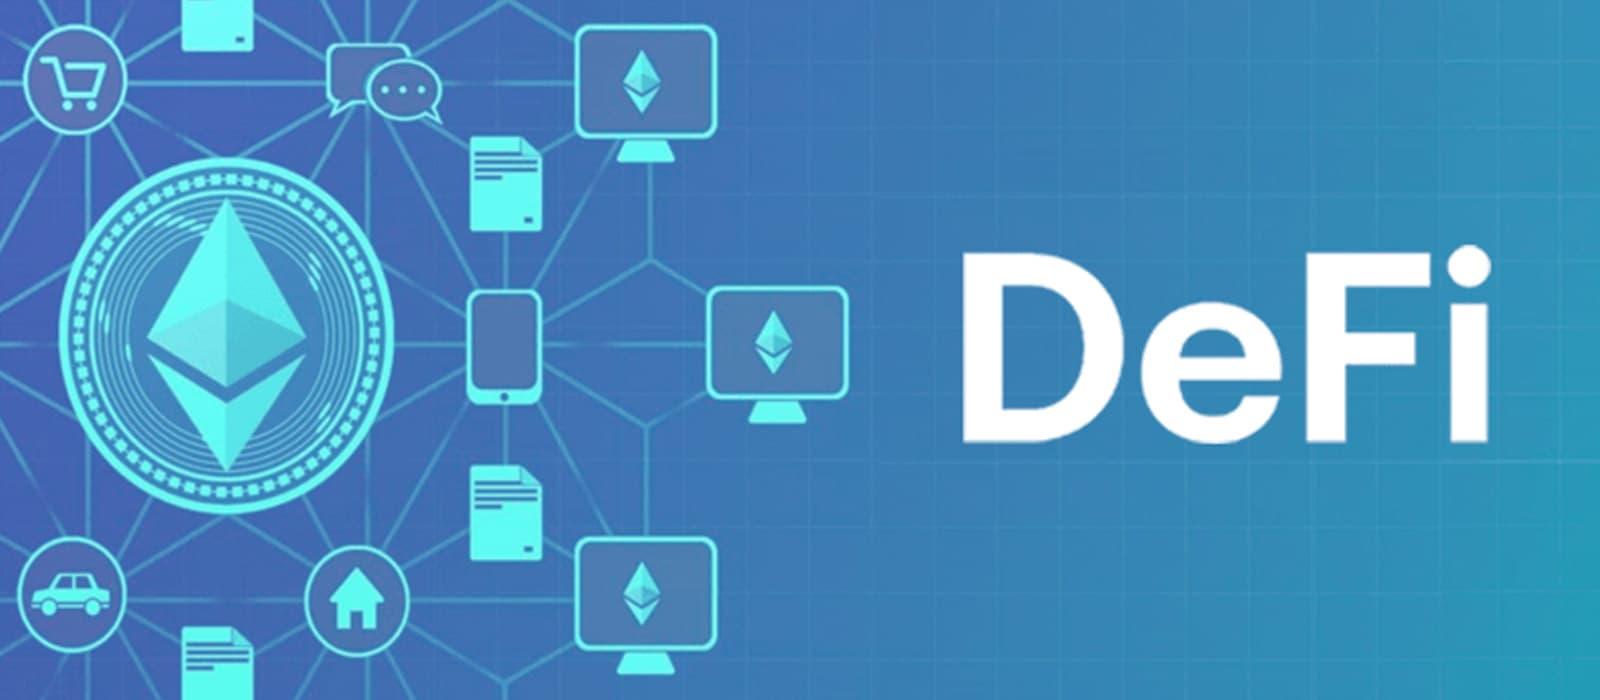 top-12-ethereum-defi-lending-dex-payment-main-1600